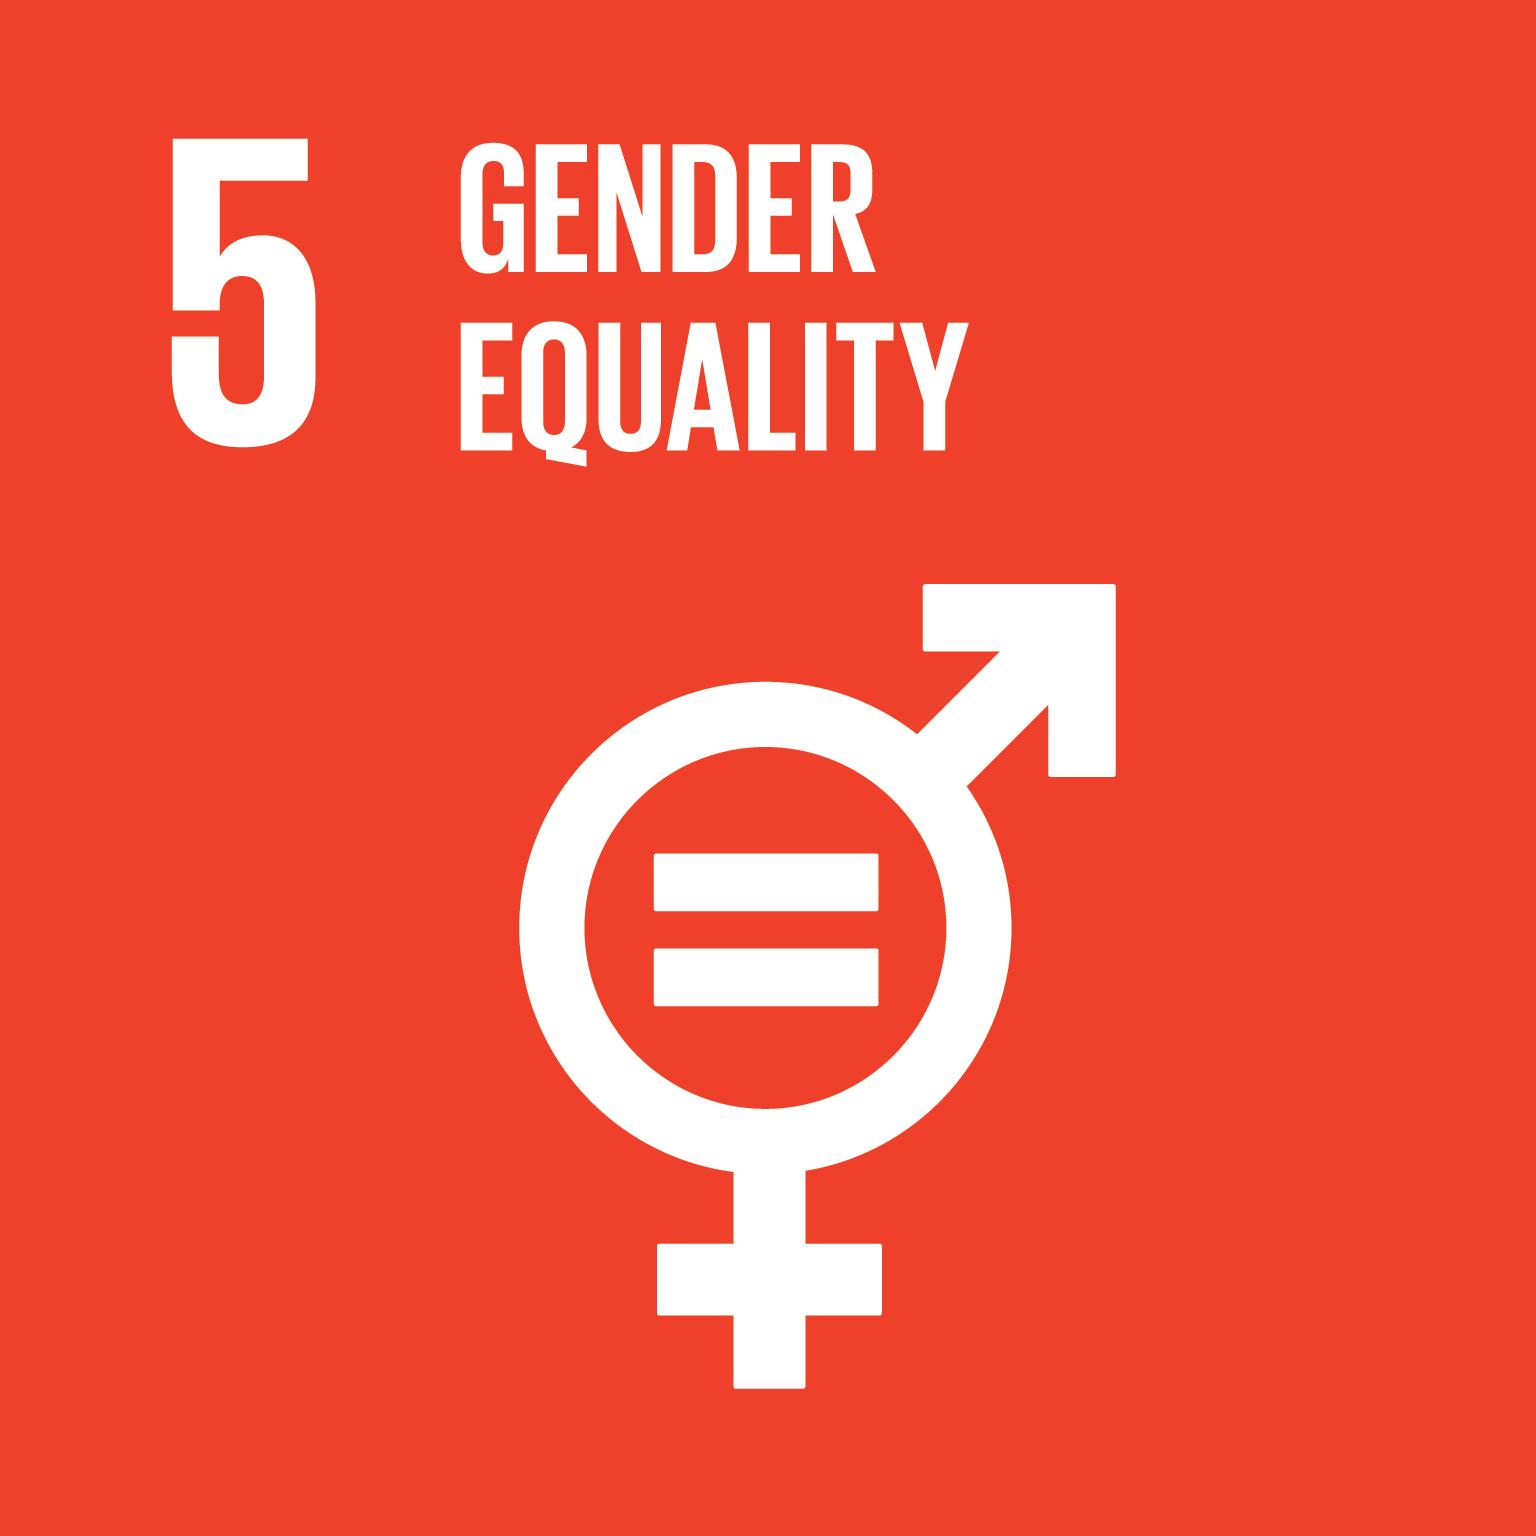 E_SDG goals_icons-individual-rgb-05